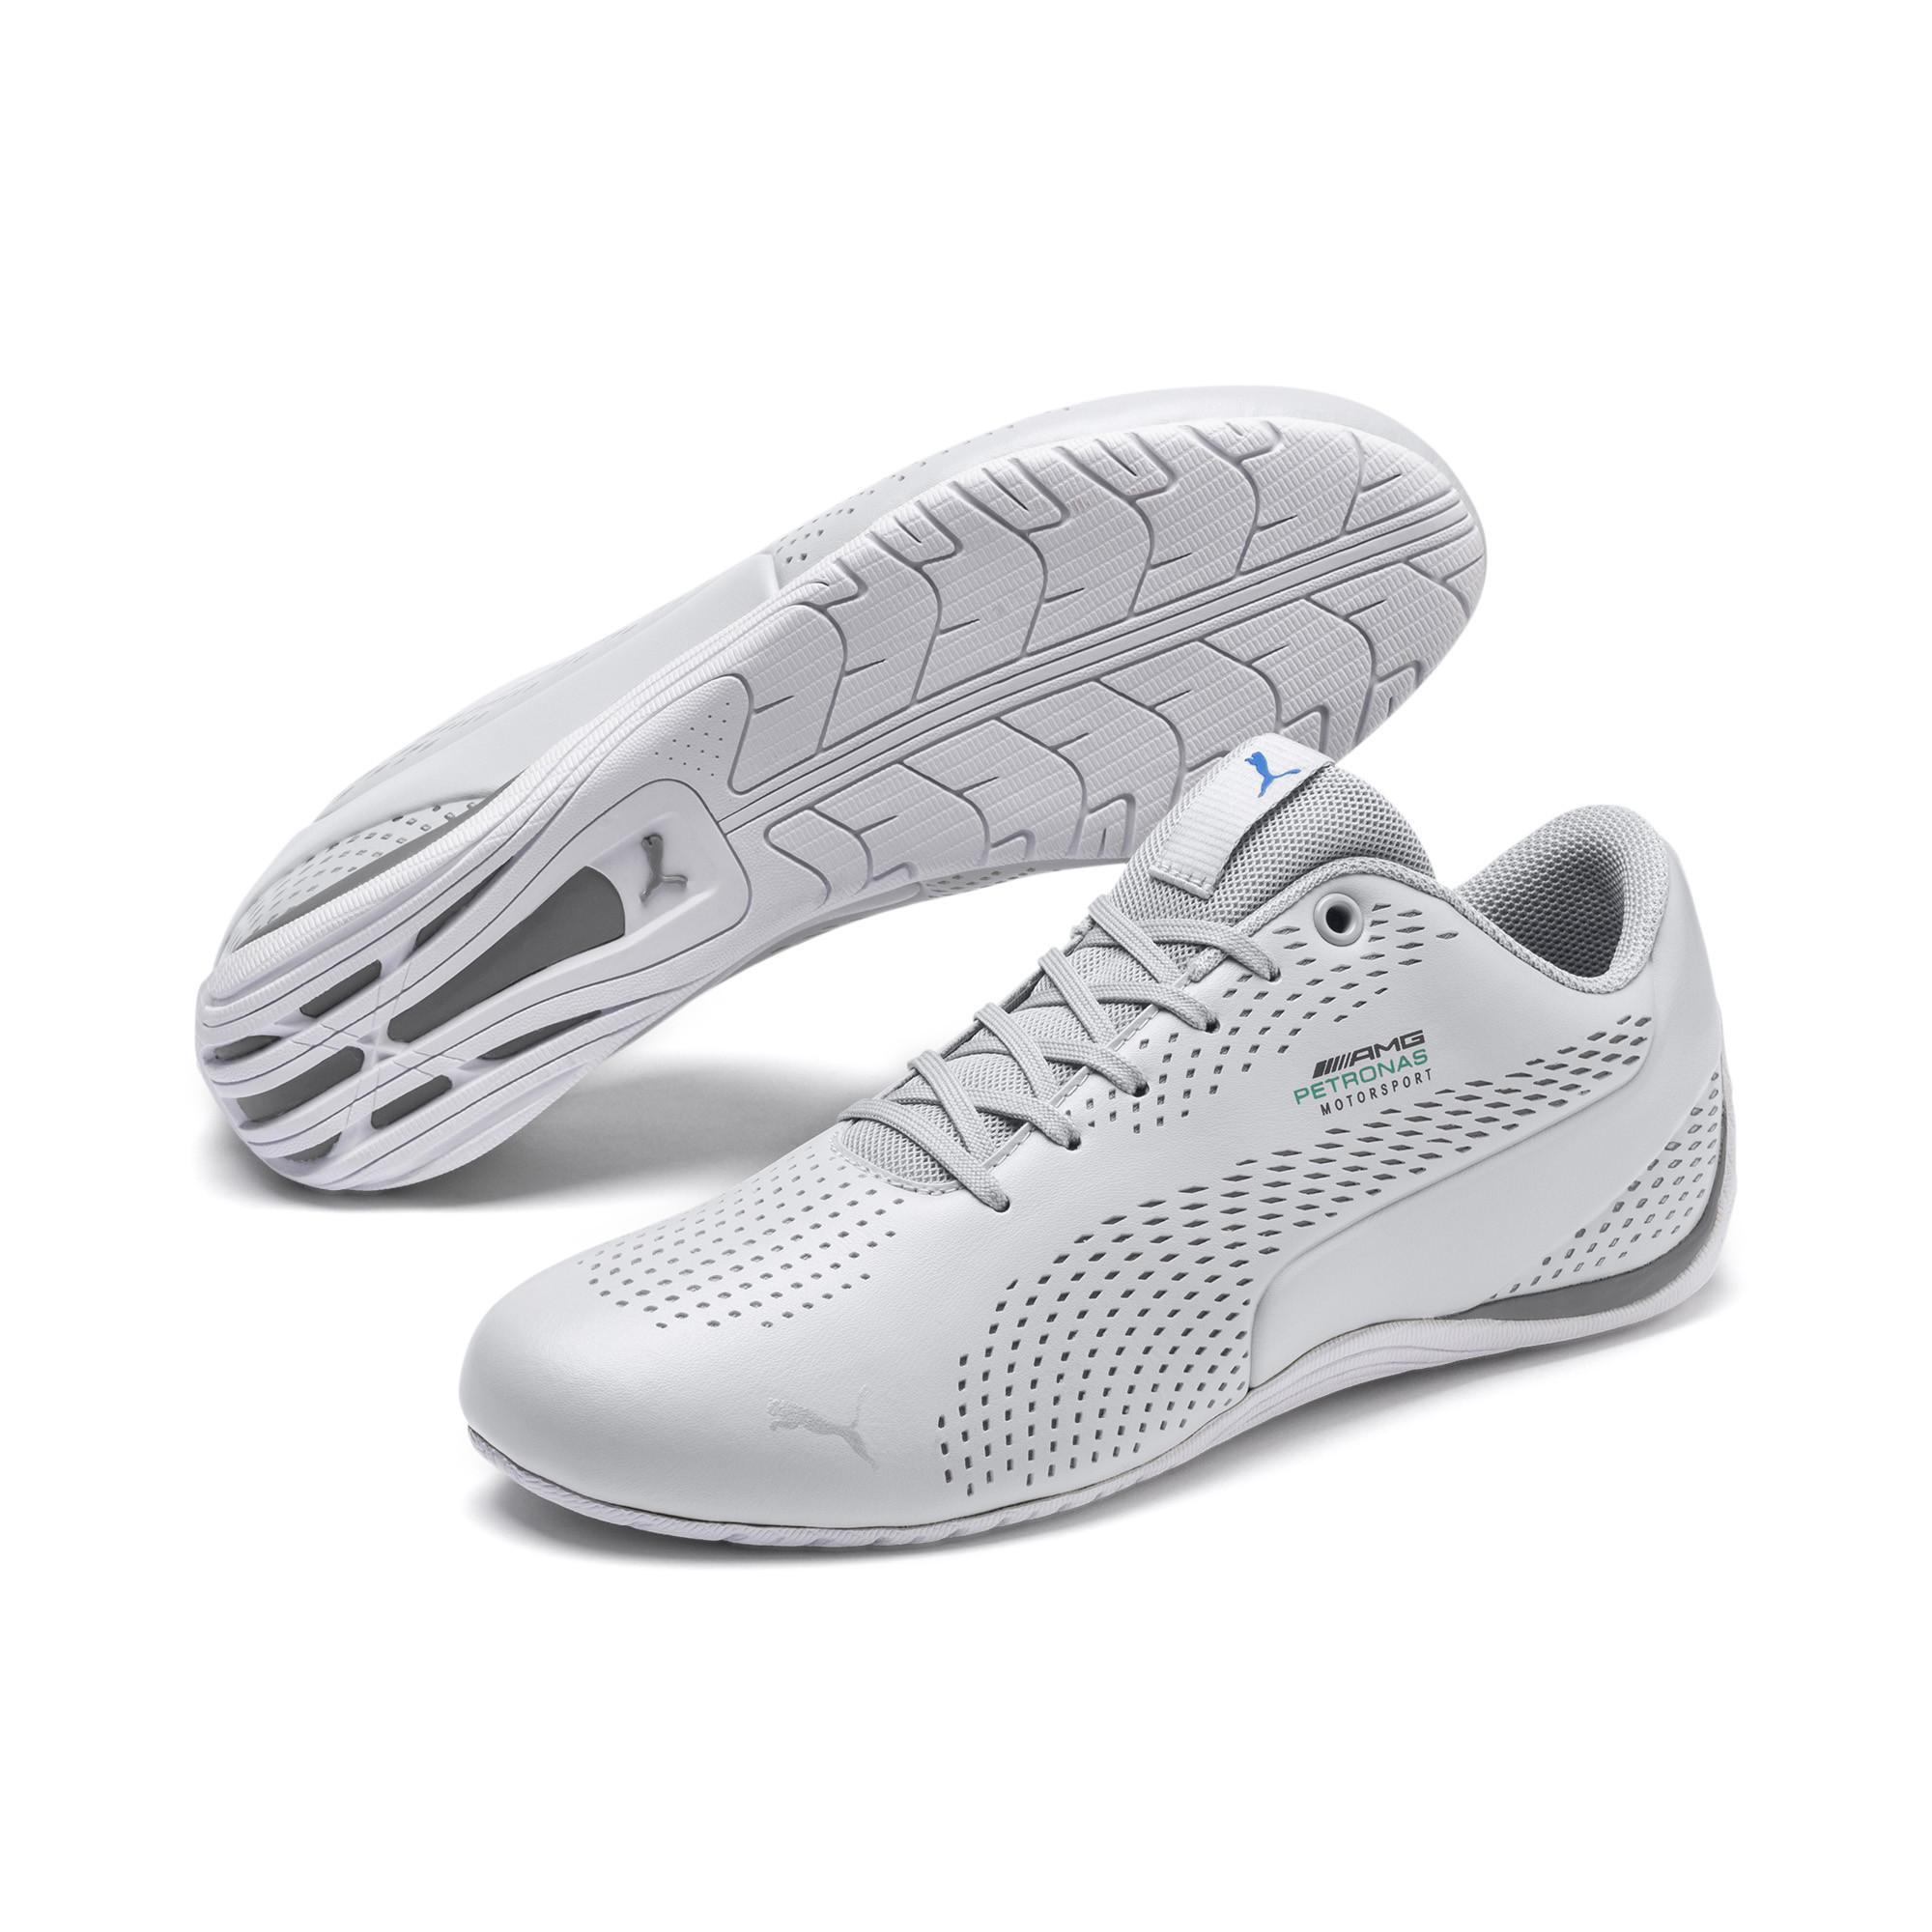 660d9bb9320e44 PUMA - White Mercedes Amg Petronas Drift Cat 5 Ultra Ii Shoes for Men -  Lyst. View fullscreen